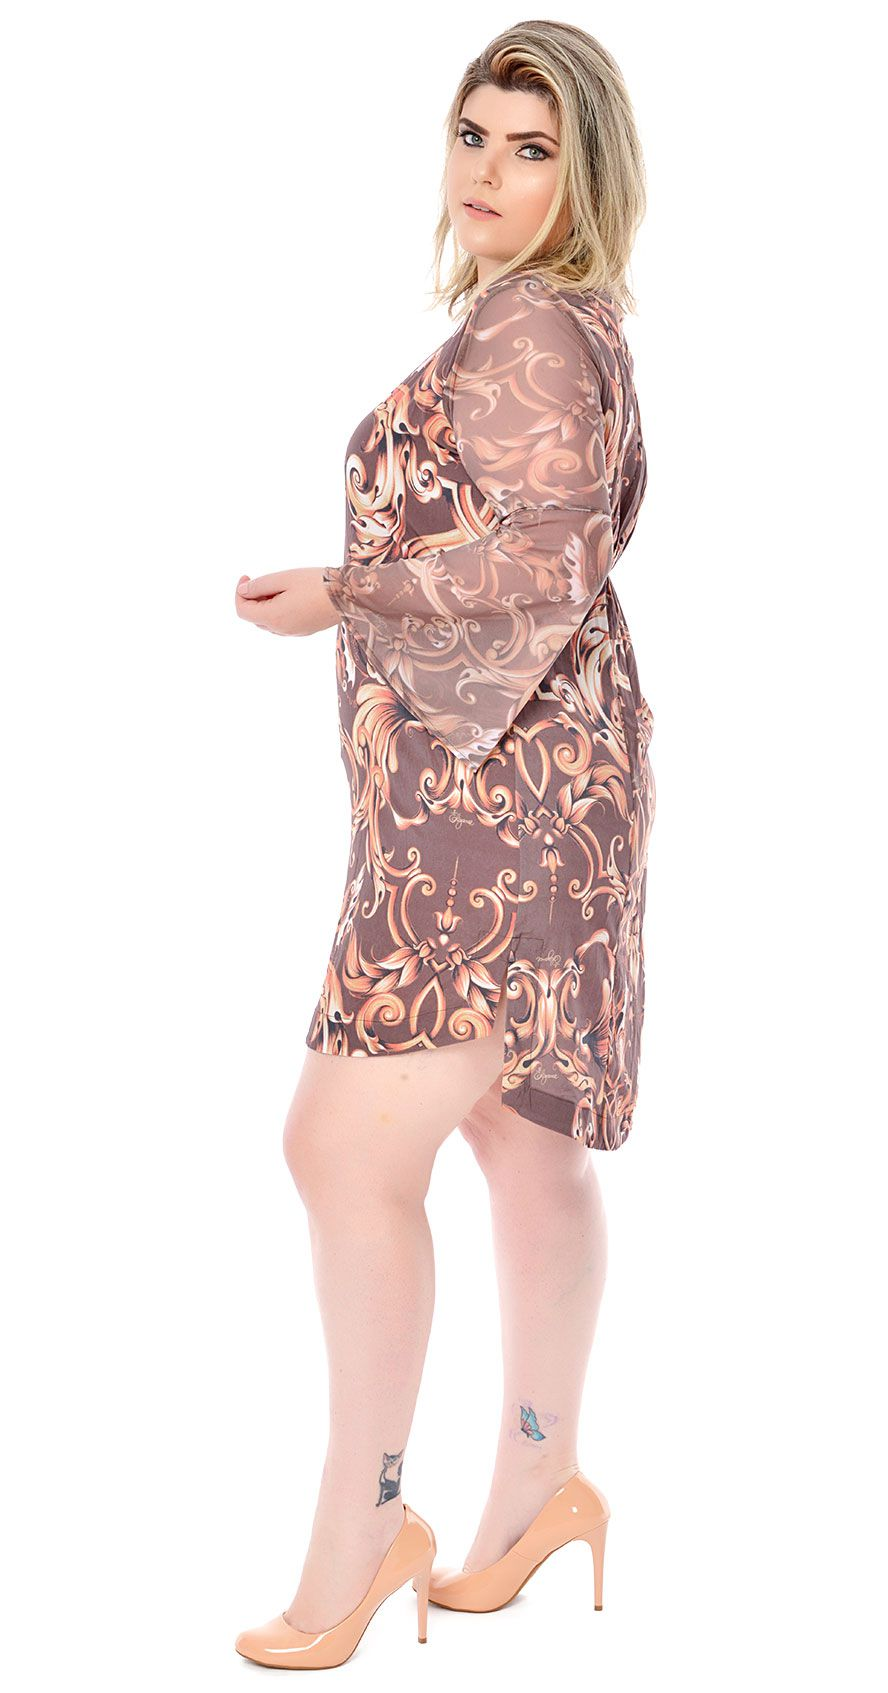 6a51ae86760 ... Vestido Plus Size Brauner